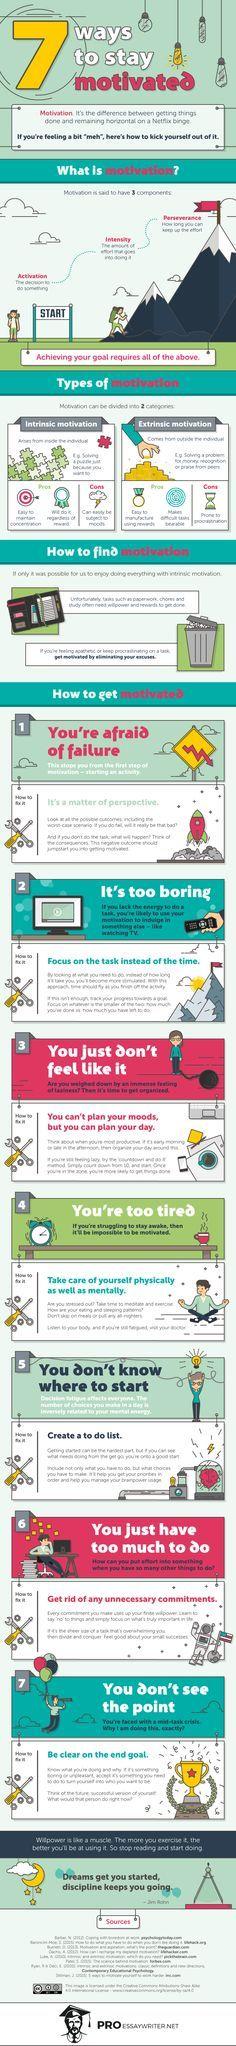 Wie sich selbst motiveren (Infografik) › ToolBlog